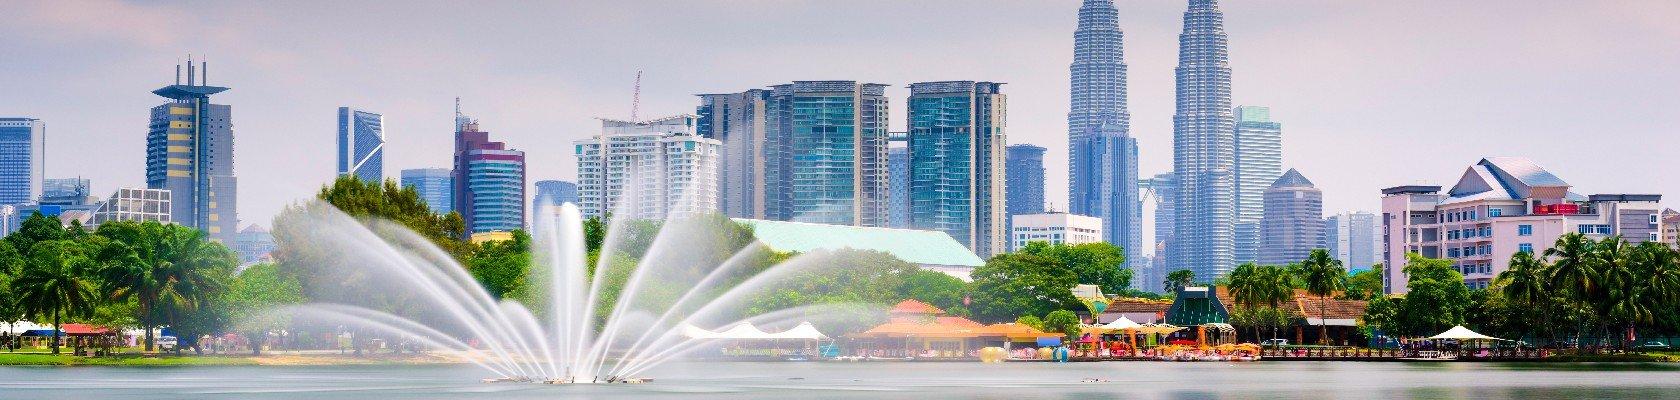 Magisch Kuala Lumpur